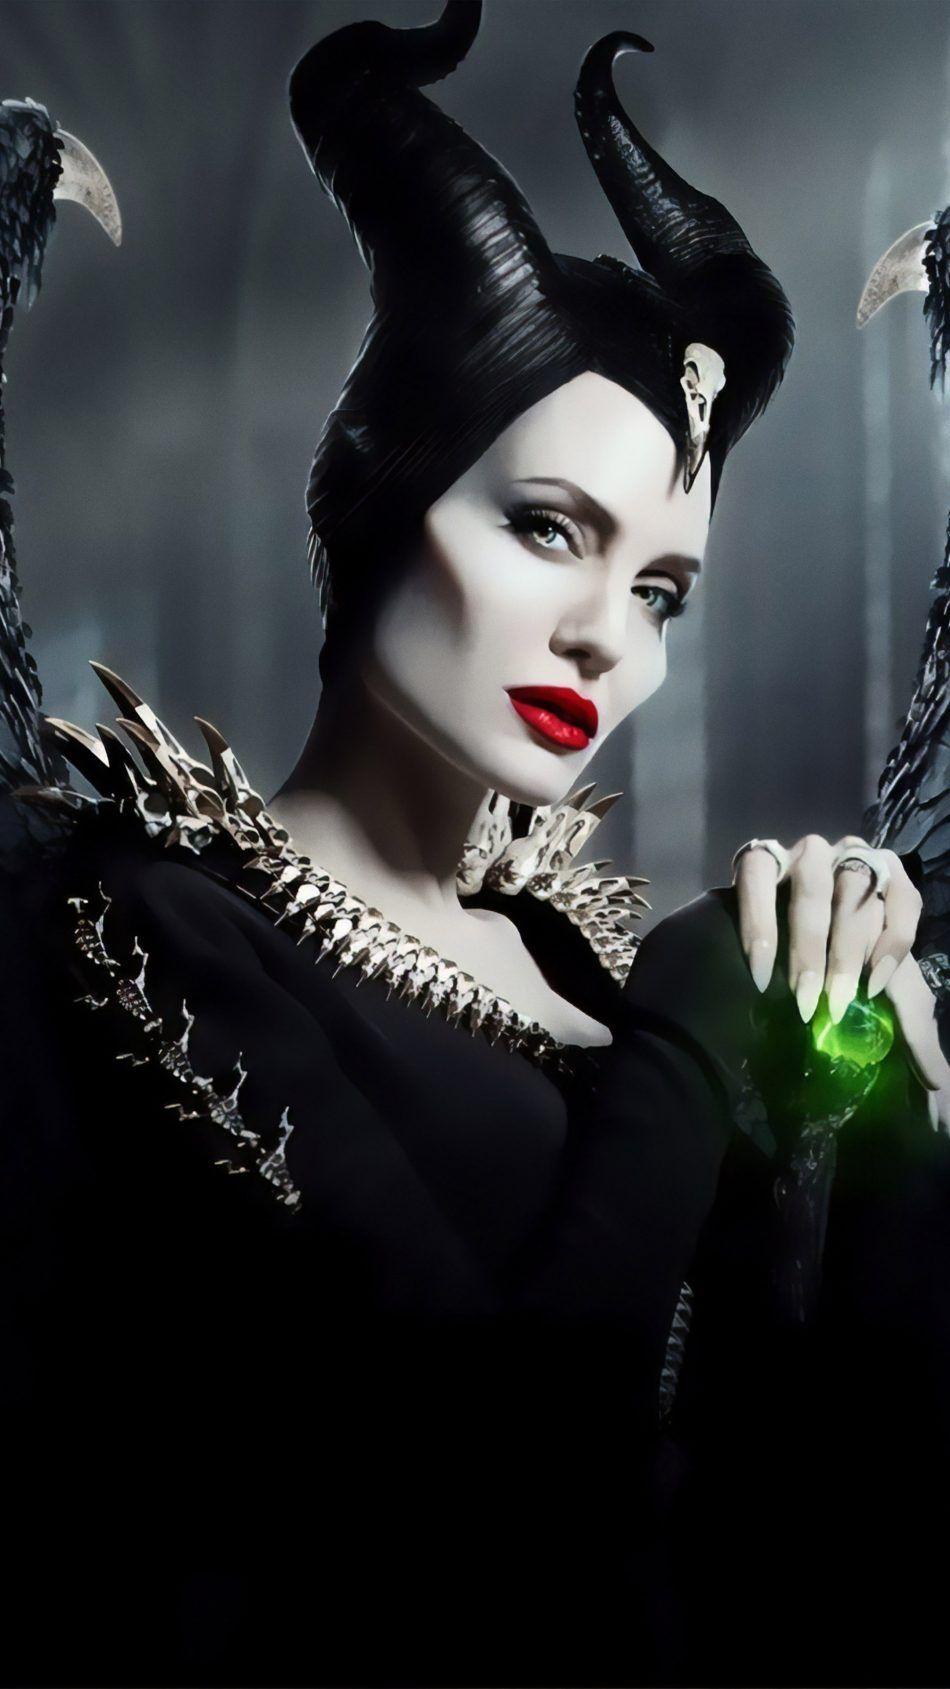 Angelina Jolie In Maleficent Mistress Of Evil 4k Ultra Hd Mobile Wallpaper Watch Maleficent Maleficent Disney Maleficent